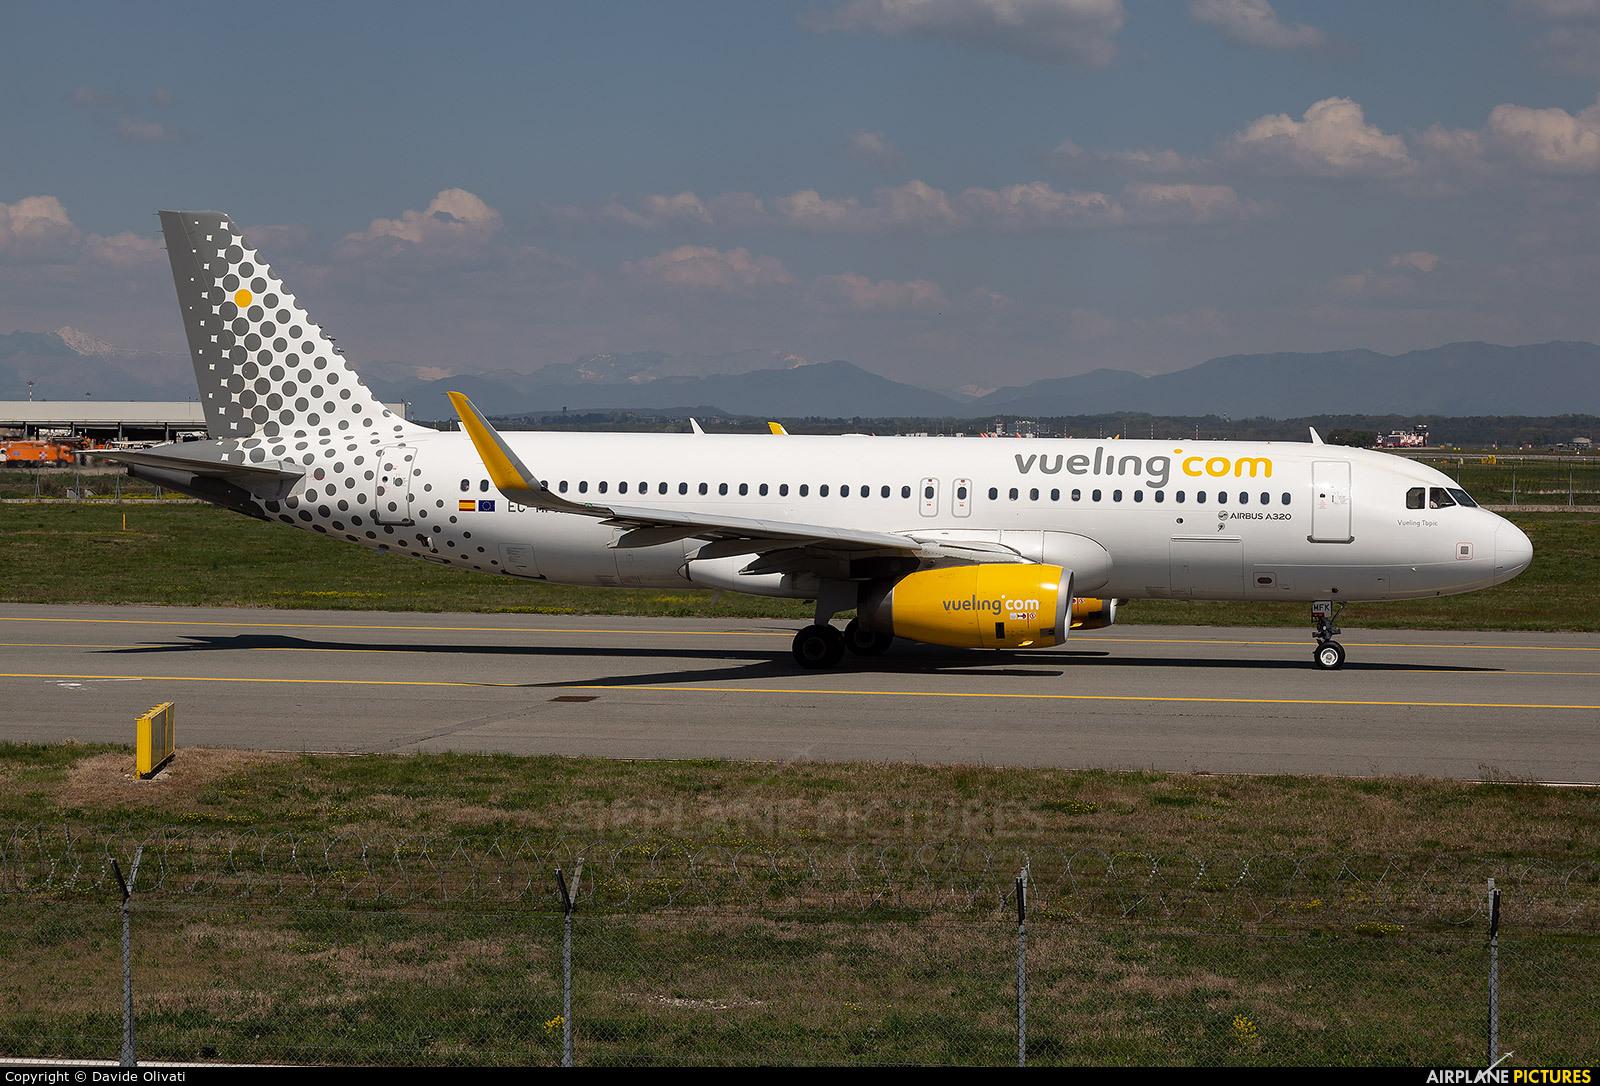 Vueling Airlines EC-MFK aircraft at Milan - Malpensa